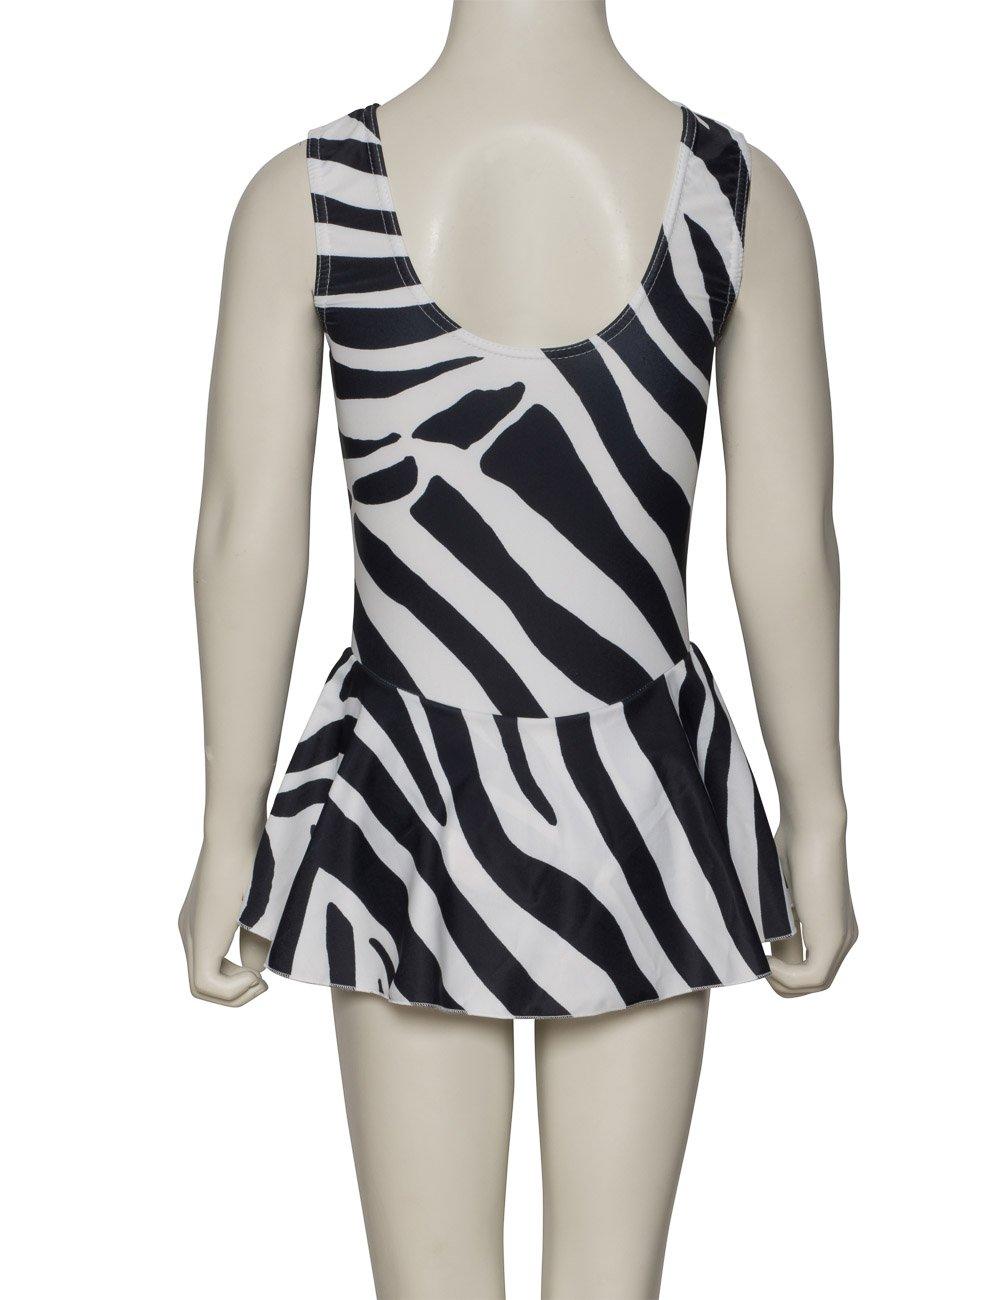 Katz Dancewear Girls ladies Leopard Zebra Or Tiger Animal Print Sleeveless Ruched Leotard /& Attached Skirt KDR005